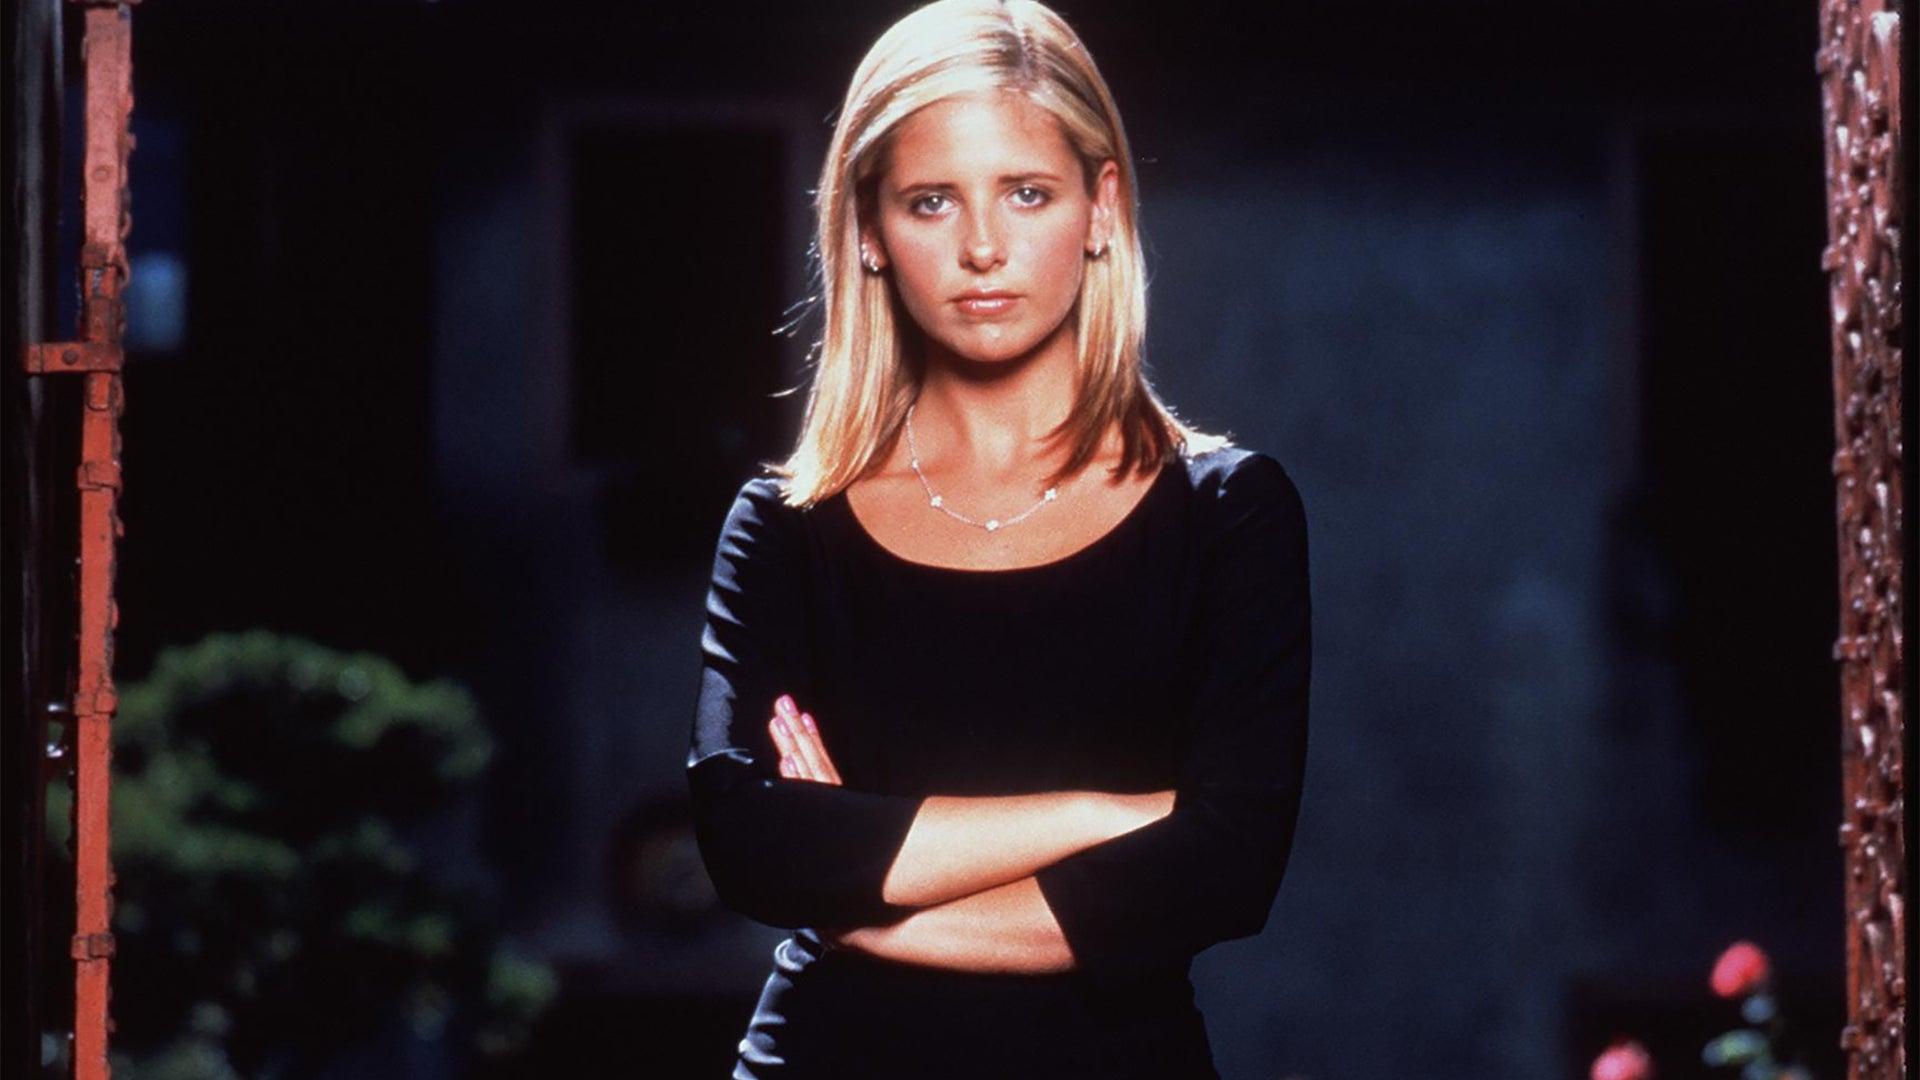 Sarah Michelle Gellar, Buffy the Vampire Slayer